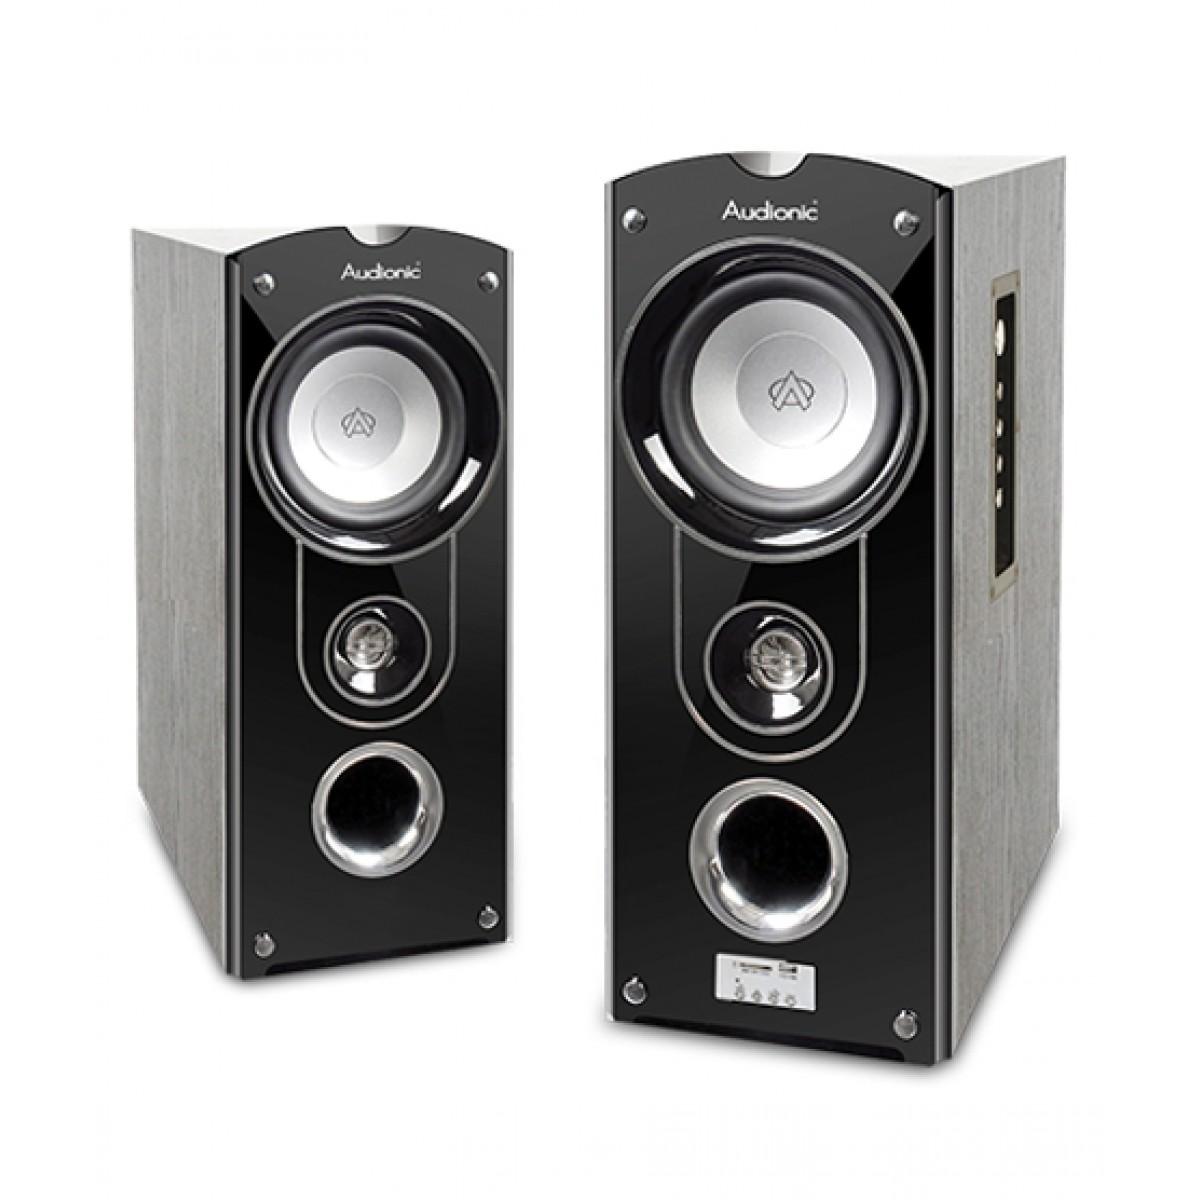 Audionic Classic 5 Bt Wireless Speaker Price In Pakistan Buy Audionic Classic 5 Bt Bluetooth Speaker Ishopping Pk